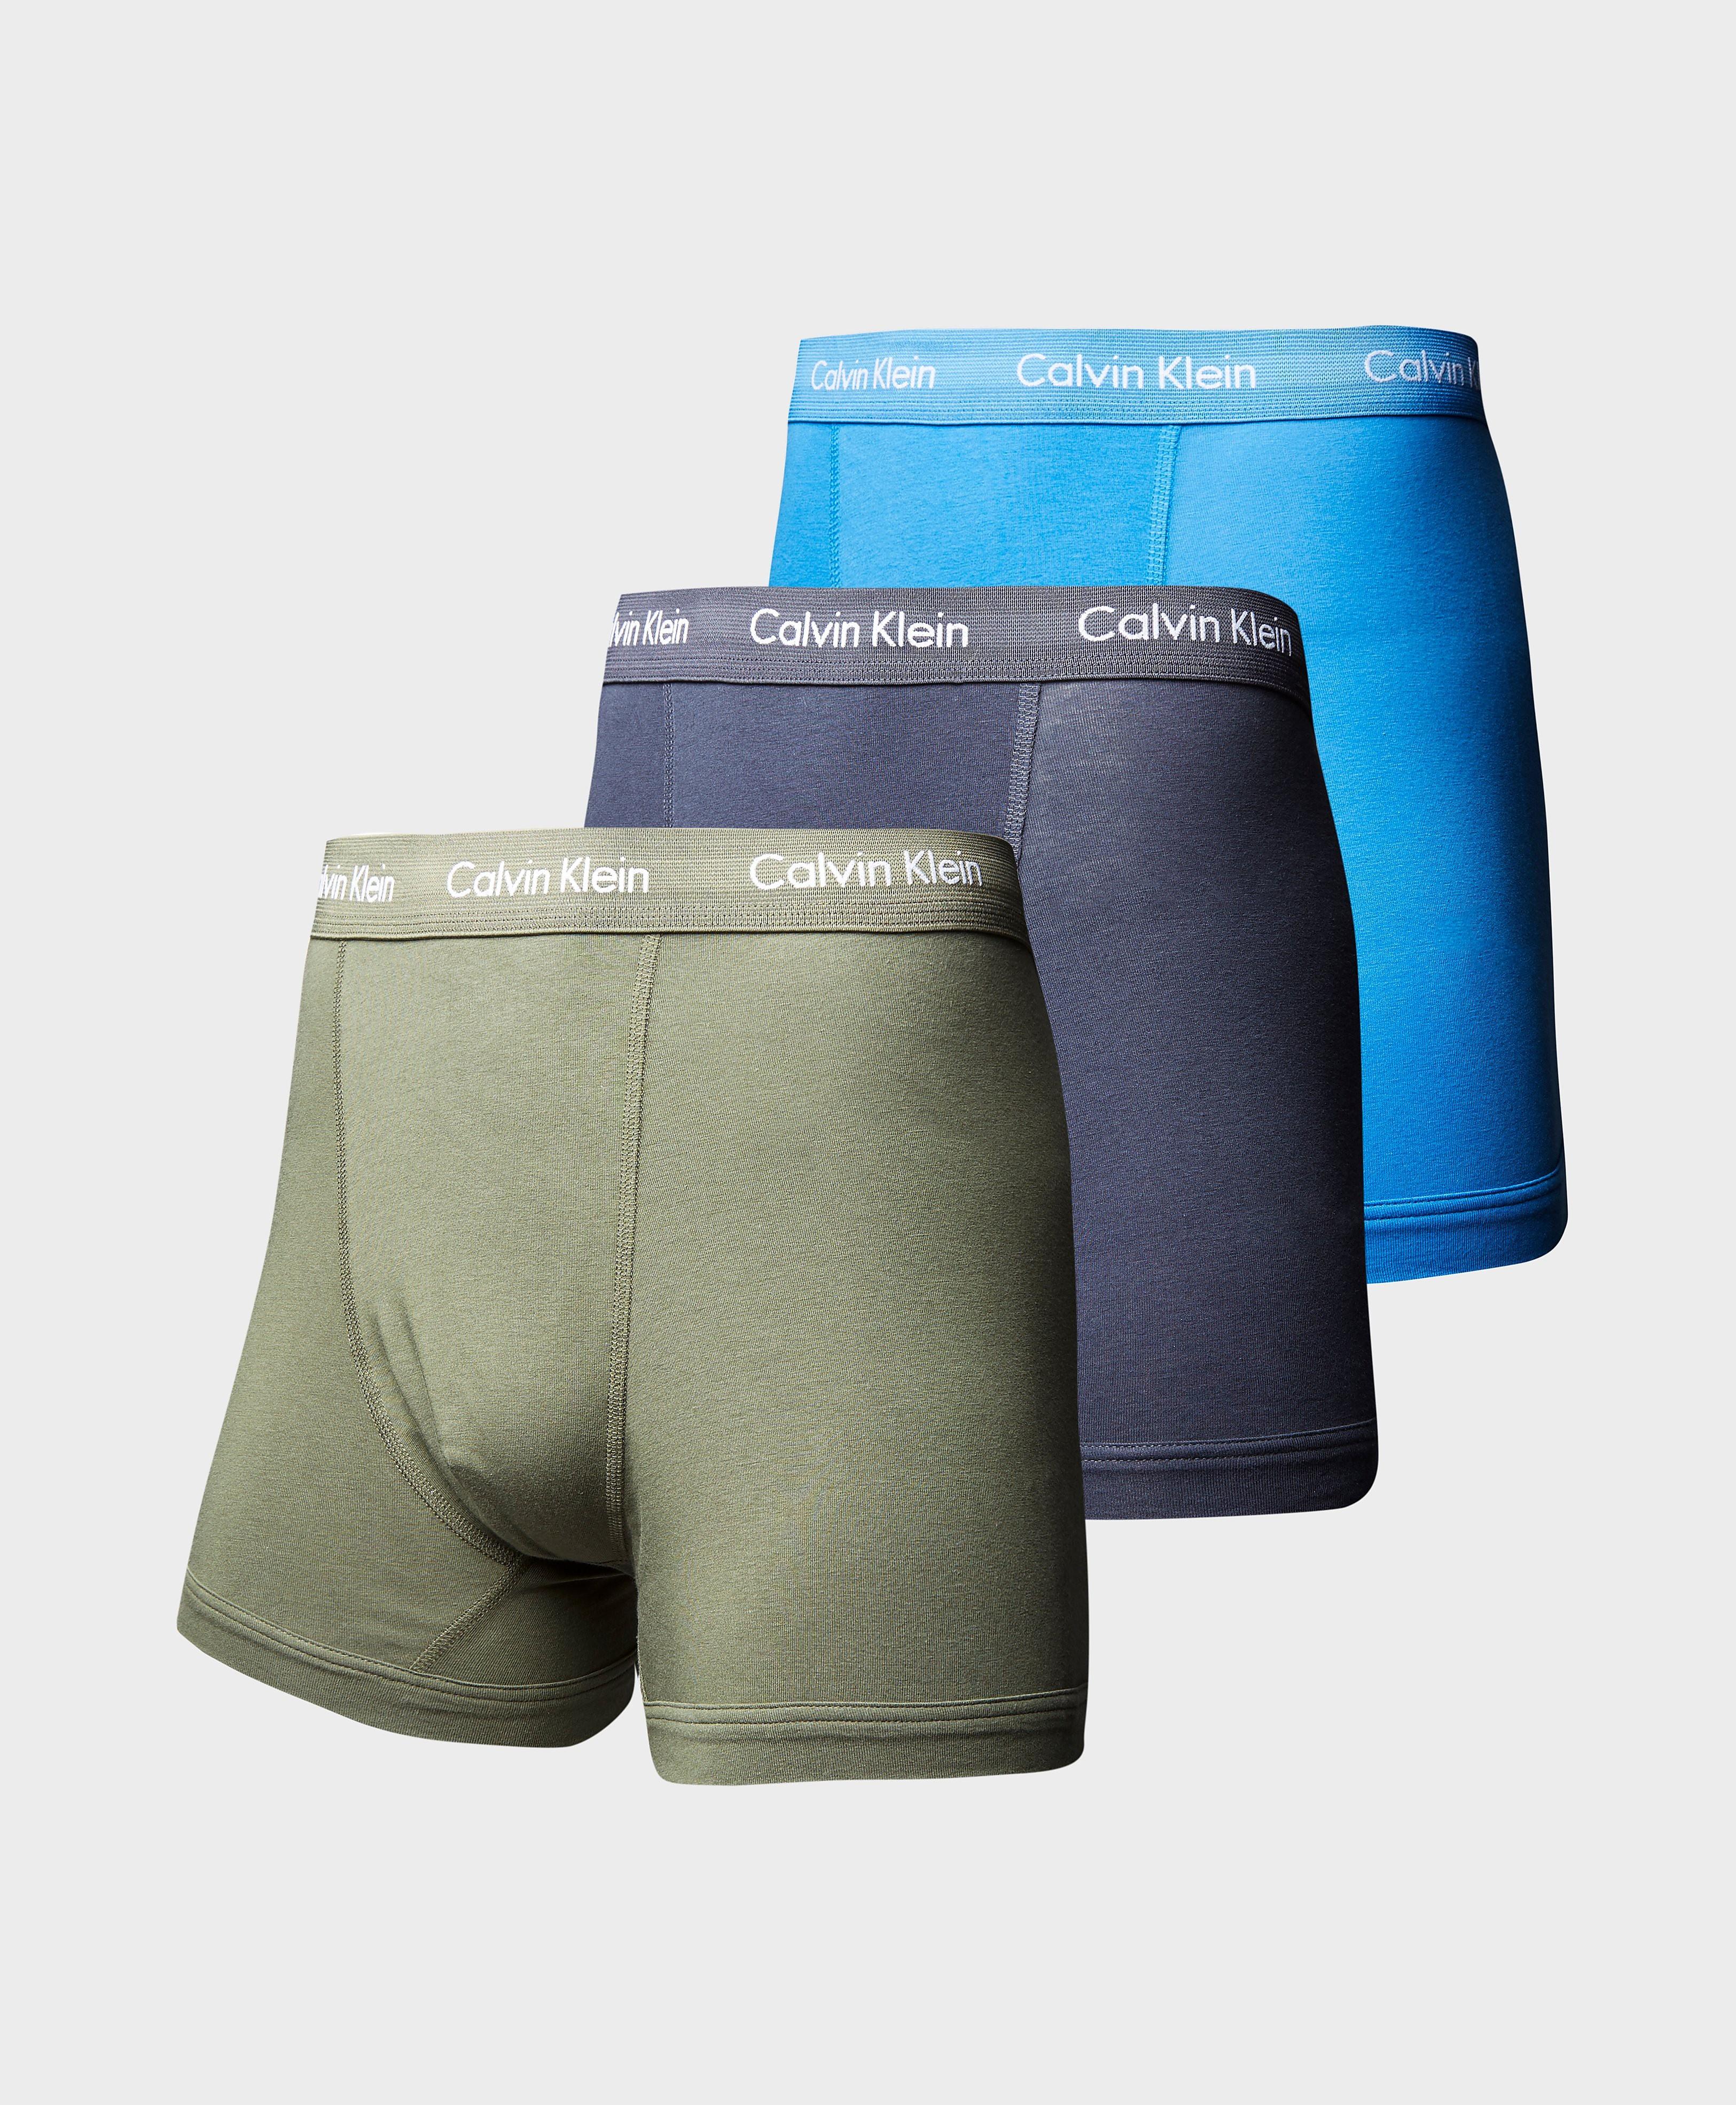 Calvin Klein 3 Pack Boxer Shorts  KhakiNavyBlue KhakiNavyBlue